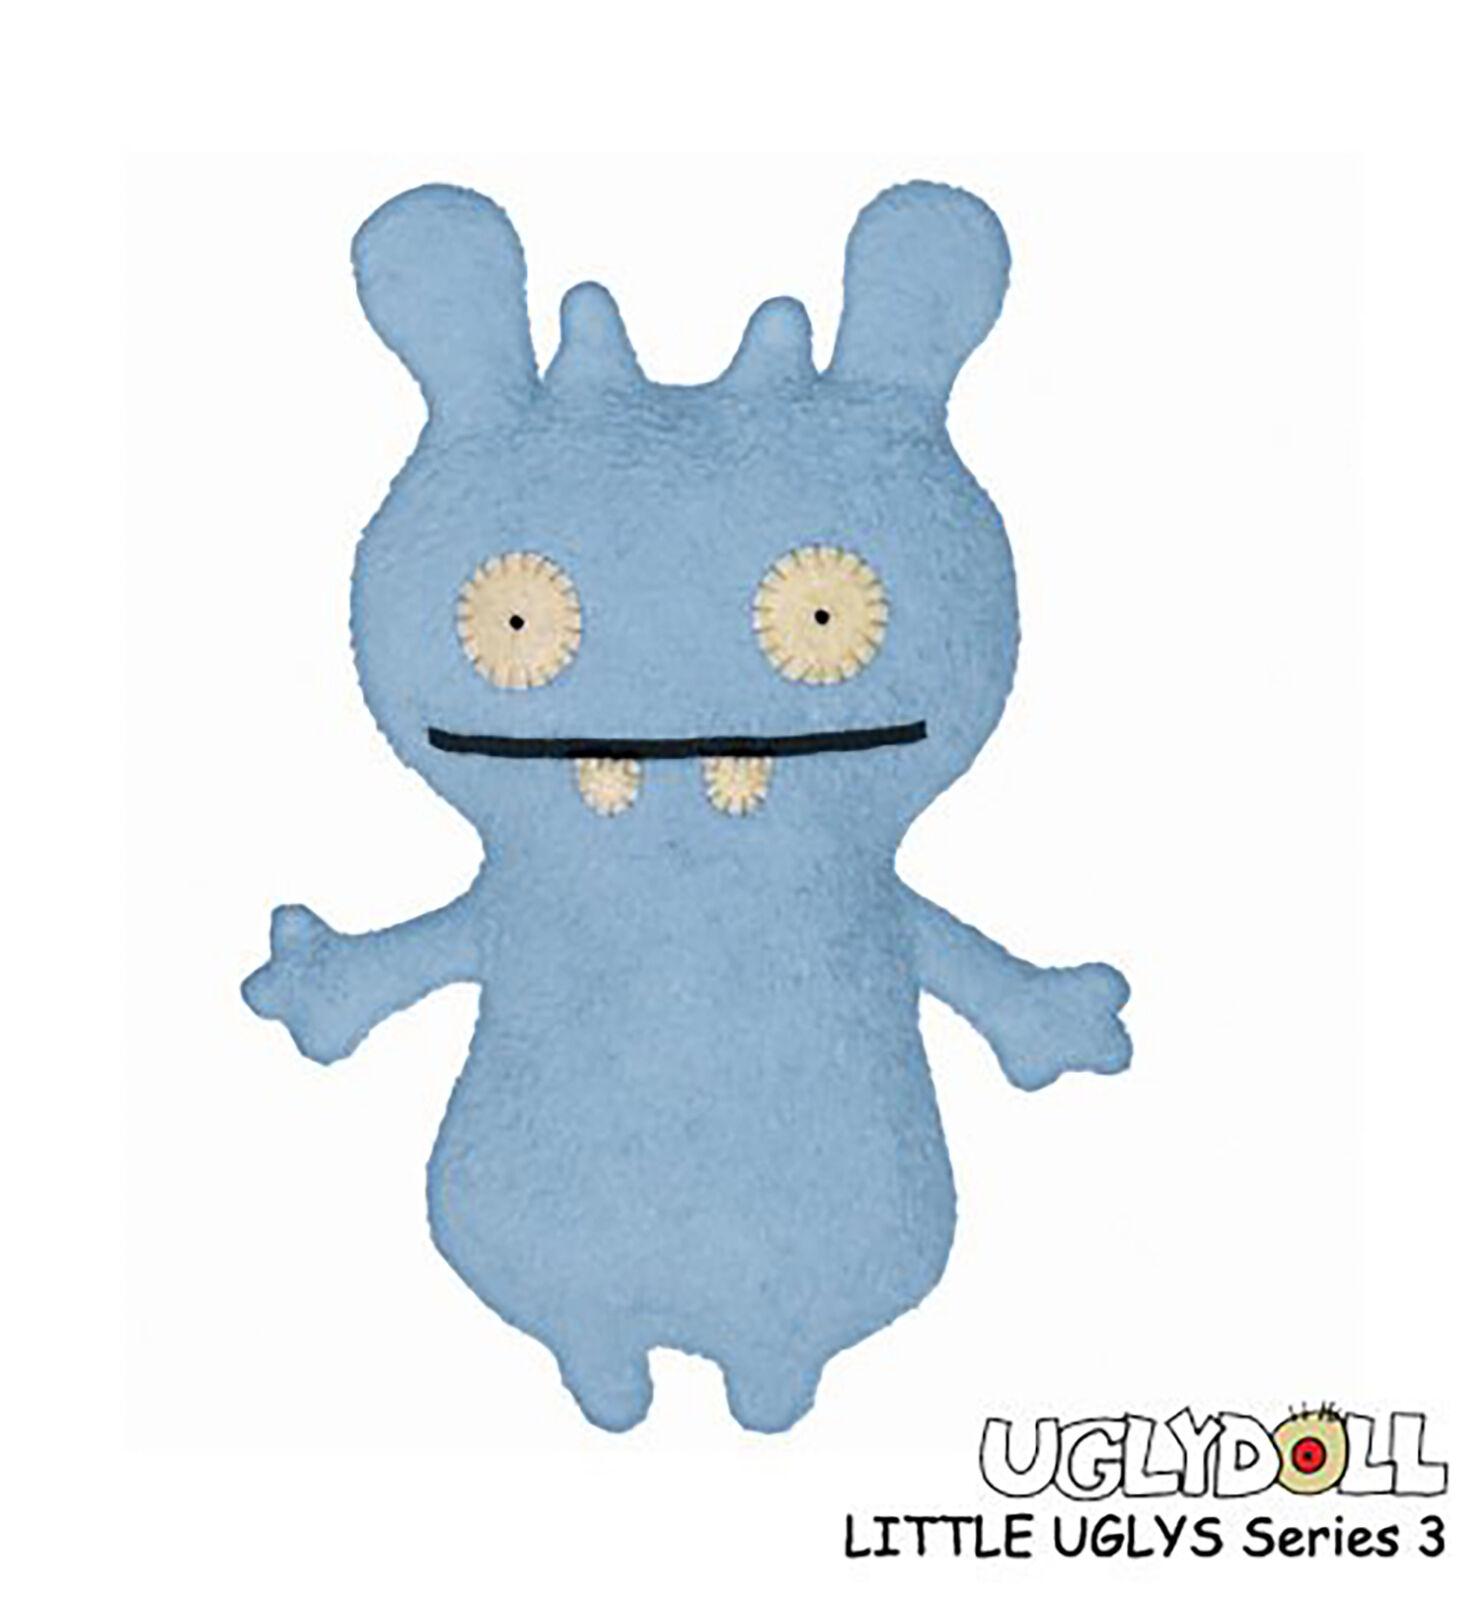 Ugly Doll - Little Uglys Series 3 - DEER UGLY (54151)